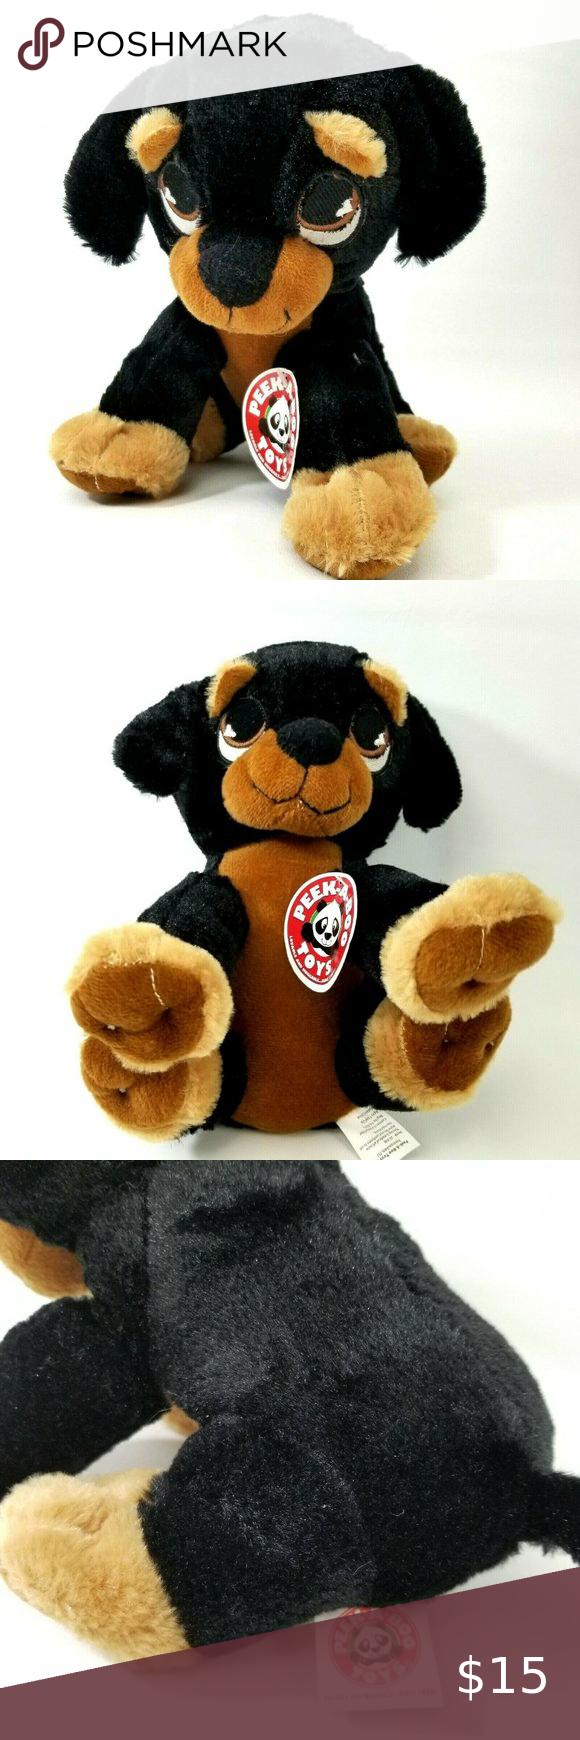 Rottweiler Puppy Dog Plush By Peek A Boo Toys Boo Toy Rottweiler Puppies Dogs And Puppies [ 1740 x 580 Pixel ]